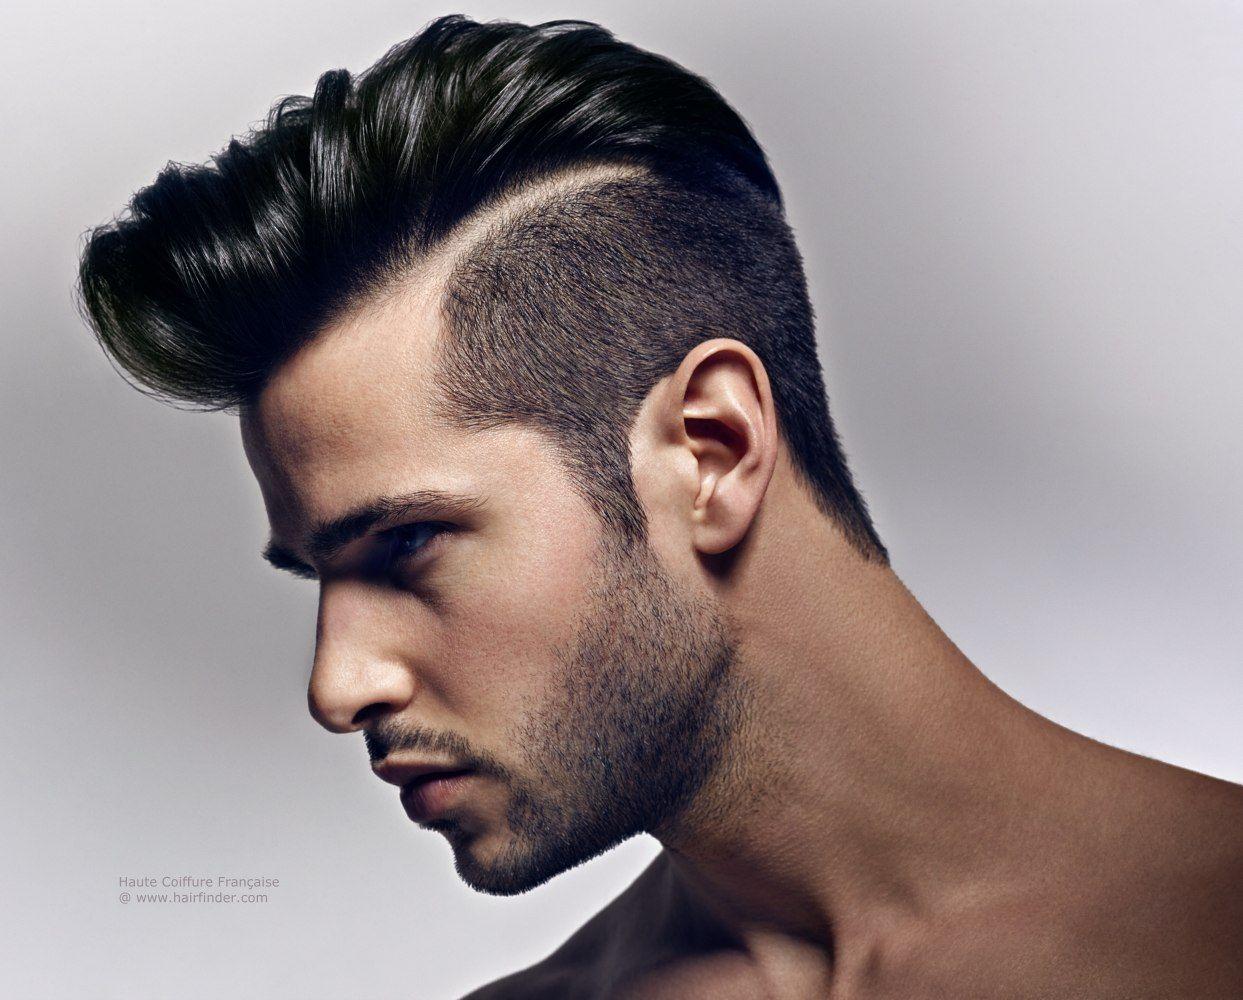 Pin By Mens Haircutsz On Cabelo Cool Hairstyles For Men Mens Hairstyles Haircuts For Men